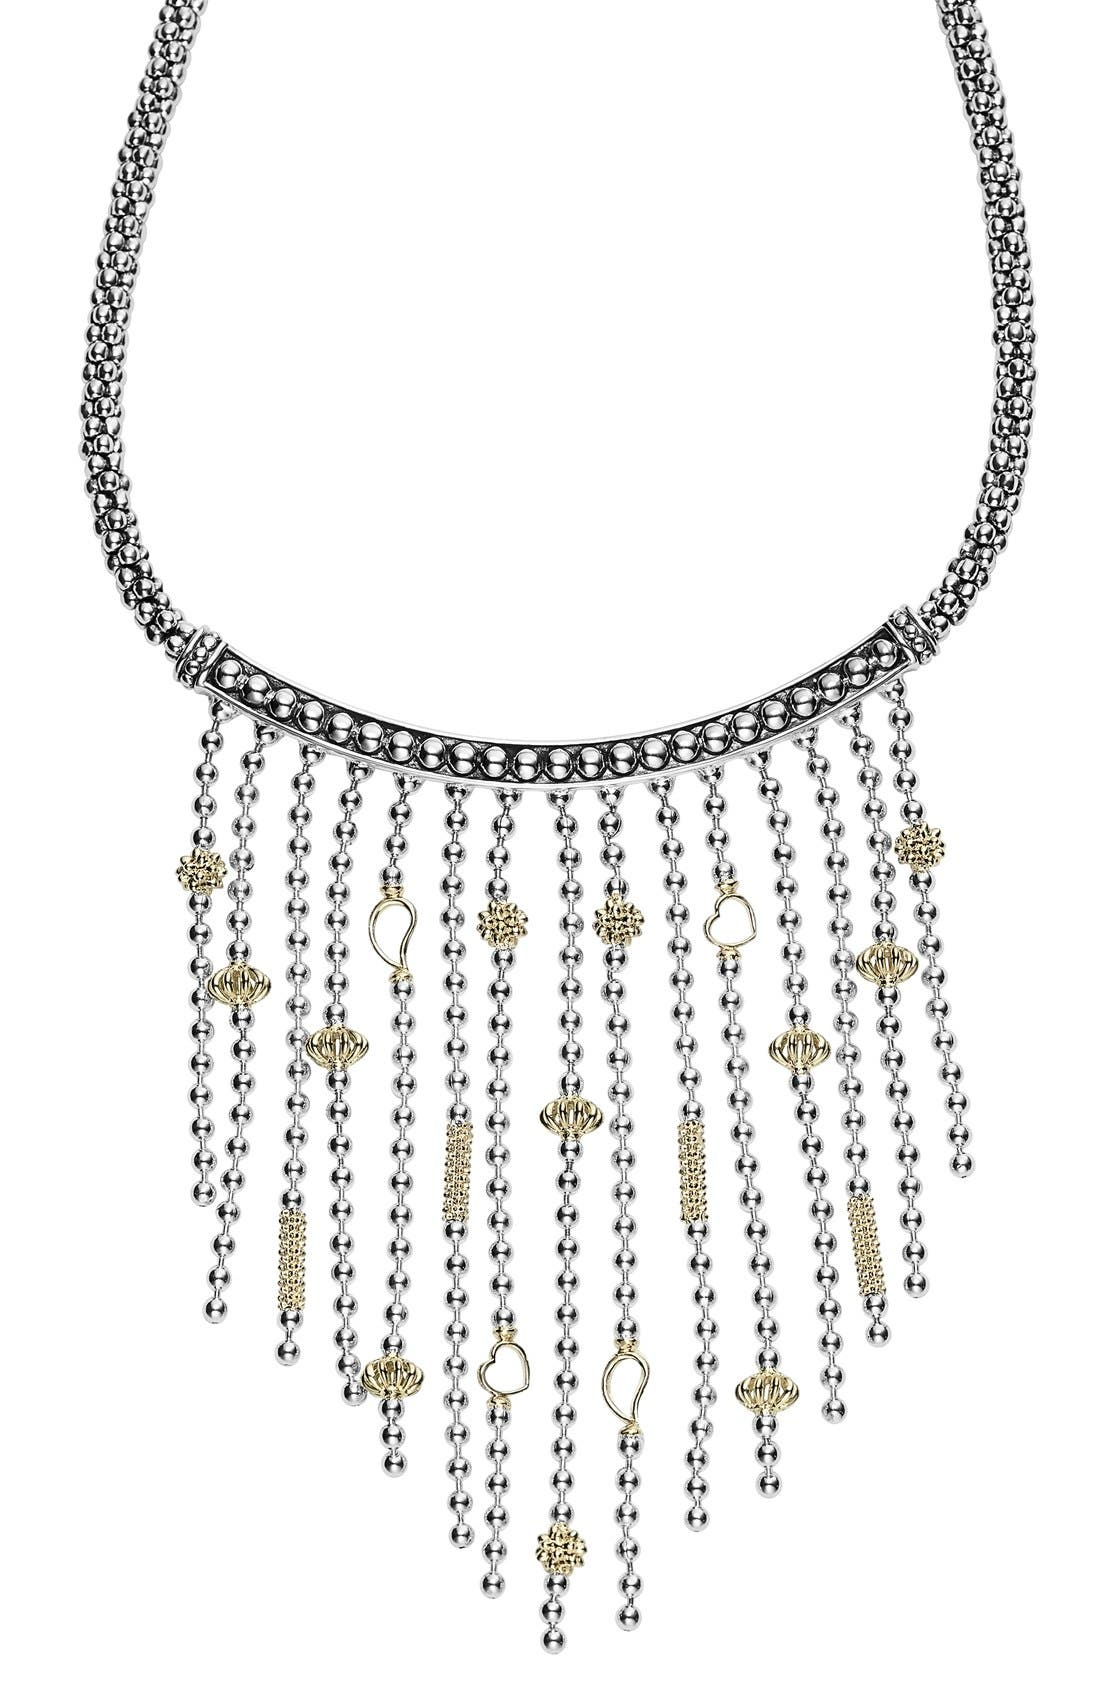 LAGOS 'Caviar Icon' Rope Bib Necklace